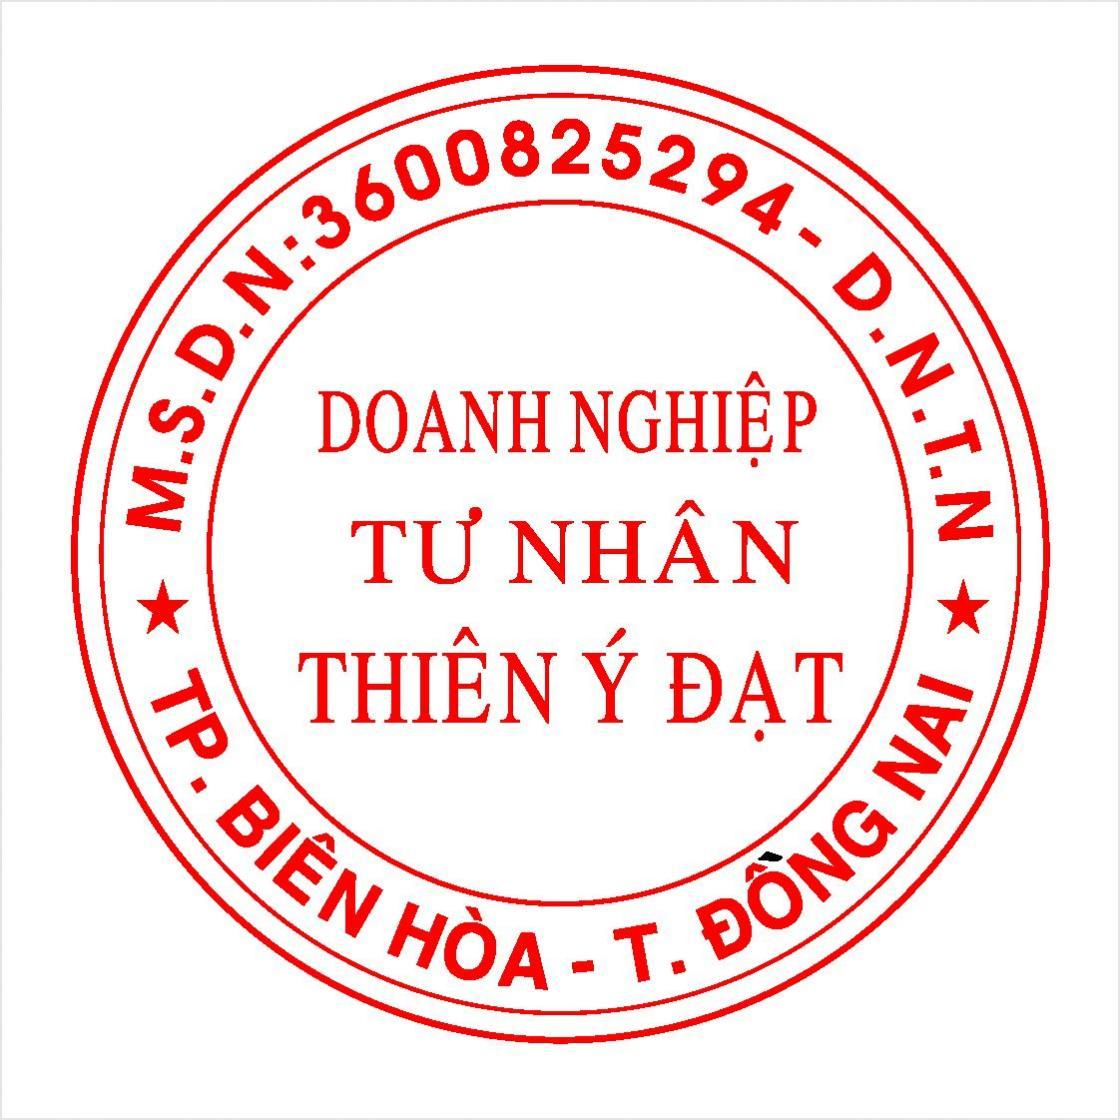 con-dau-tron-cong-ty-mau-doanh-nghiep-tu-nhan